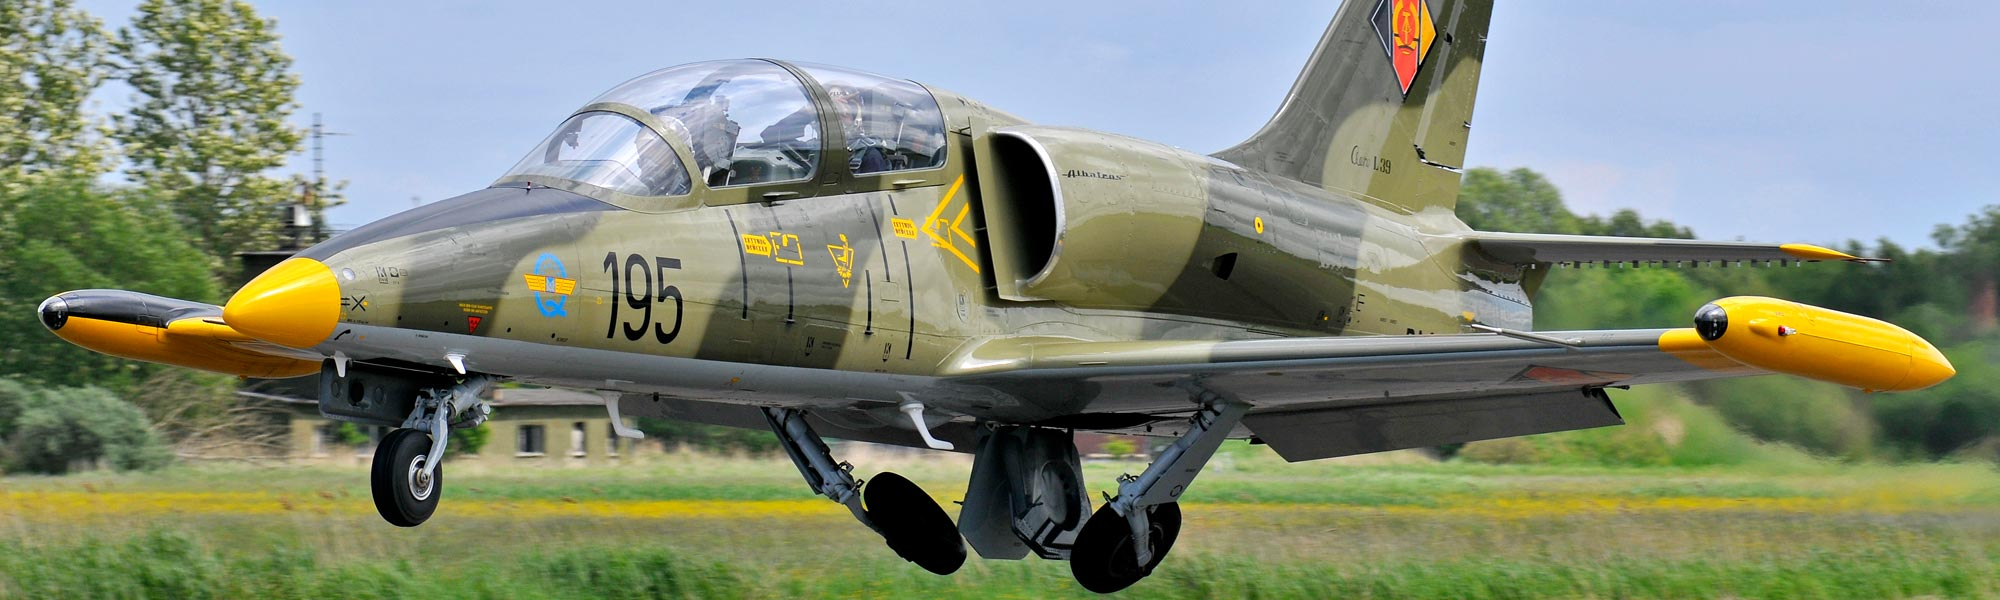 L-39 Albatros fliegen ab Paderborn